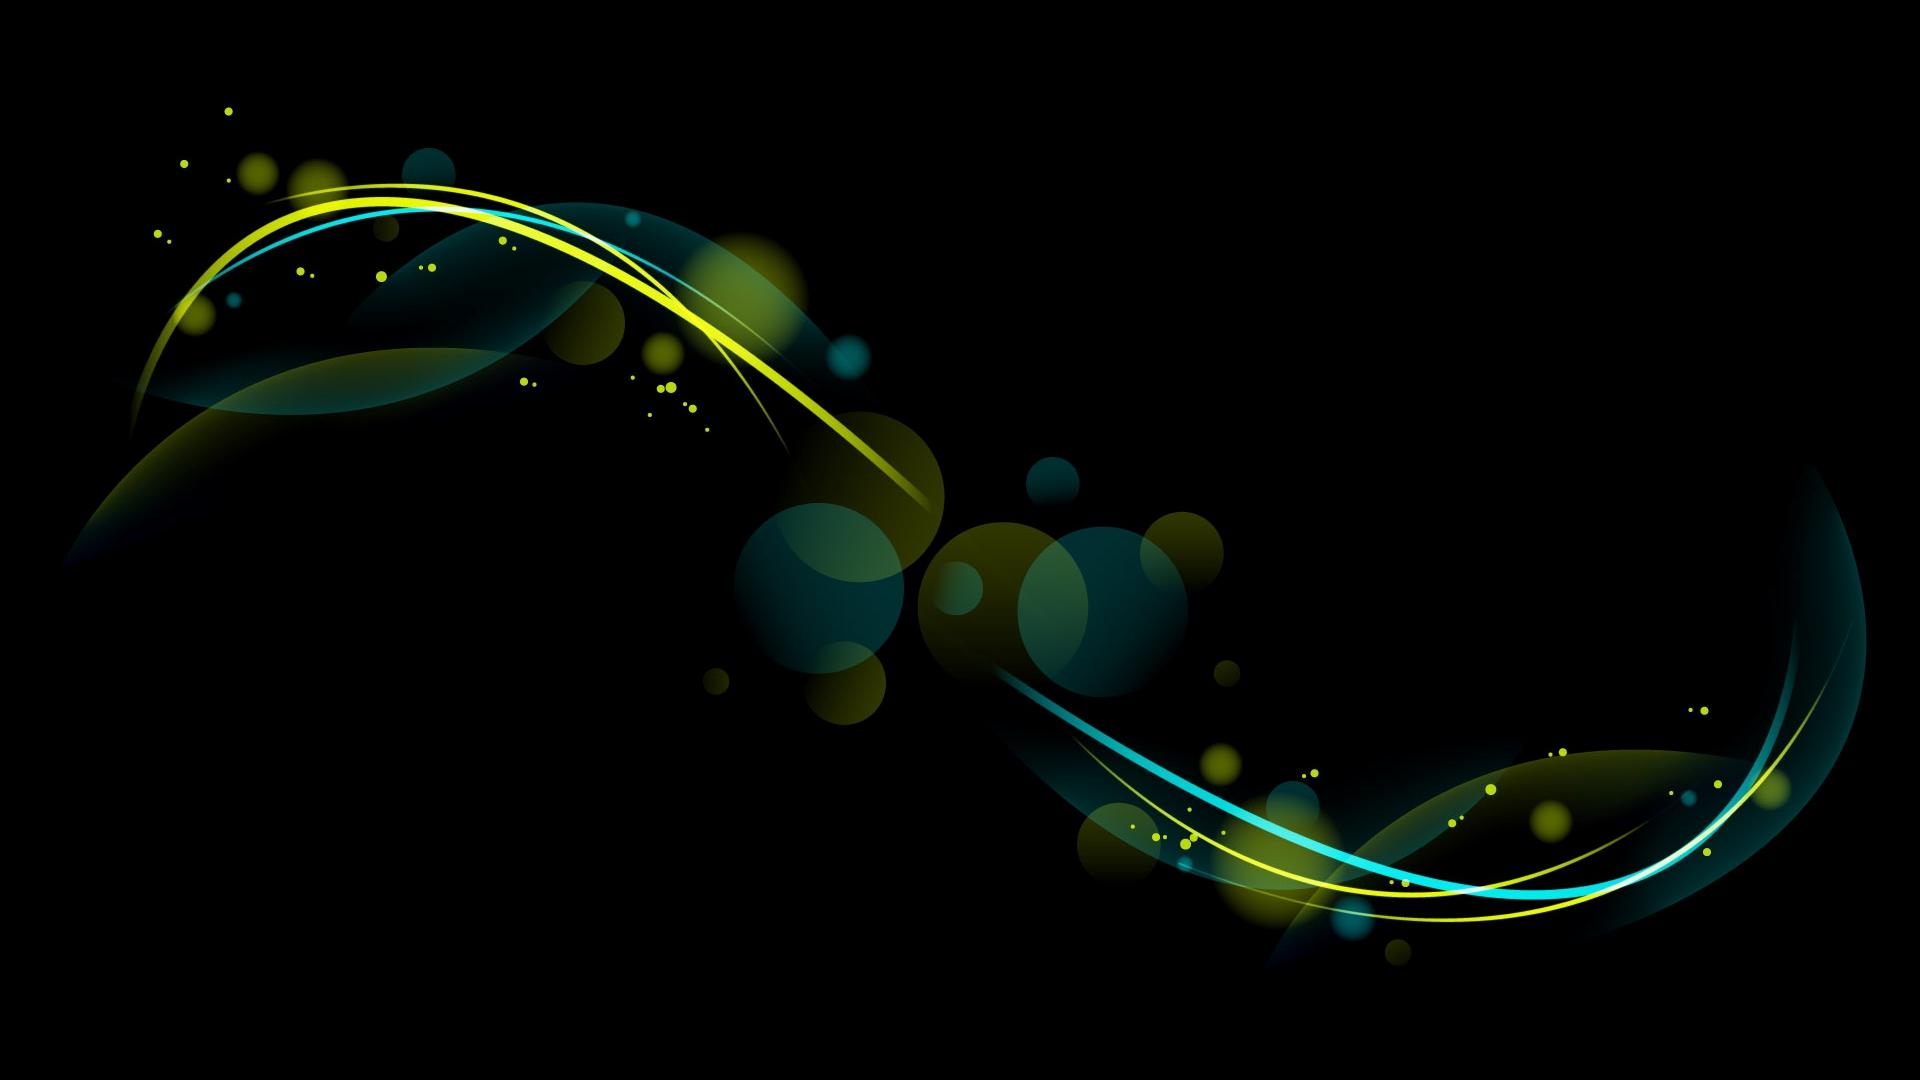 Free Download Hd Wallpapers Widescreen Art Photography Full Hd 1080p Wallpaper 1920x1200 For Your Desktop Mobile Tablet Explore 49 Hd Desktop Wallpaper Widescreen Free Hd Wallpapers 1920x1200 Free Hd